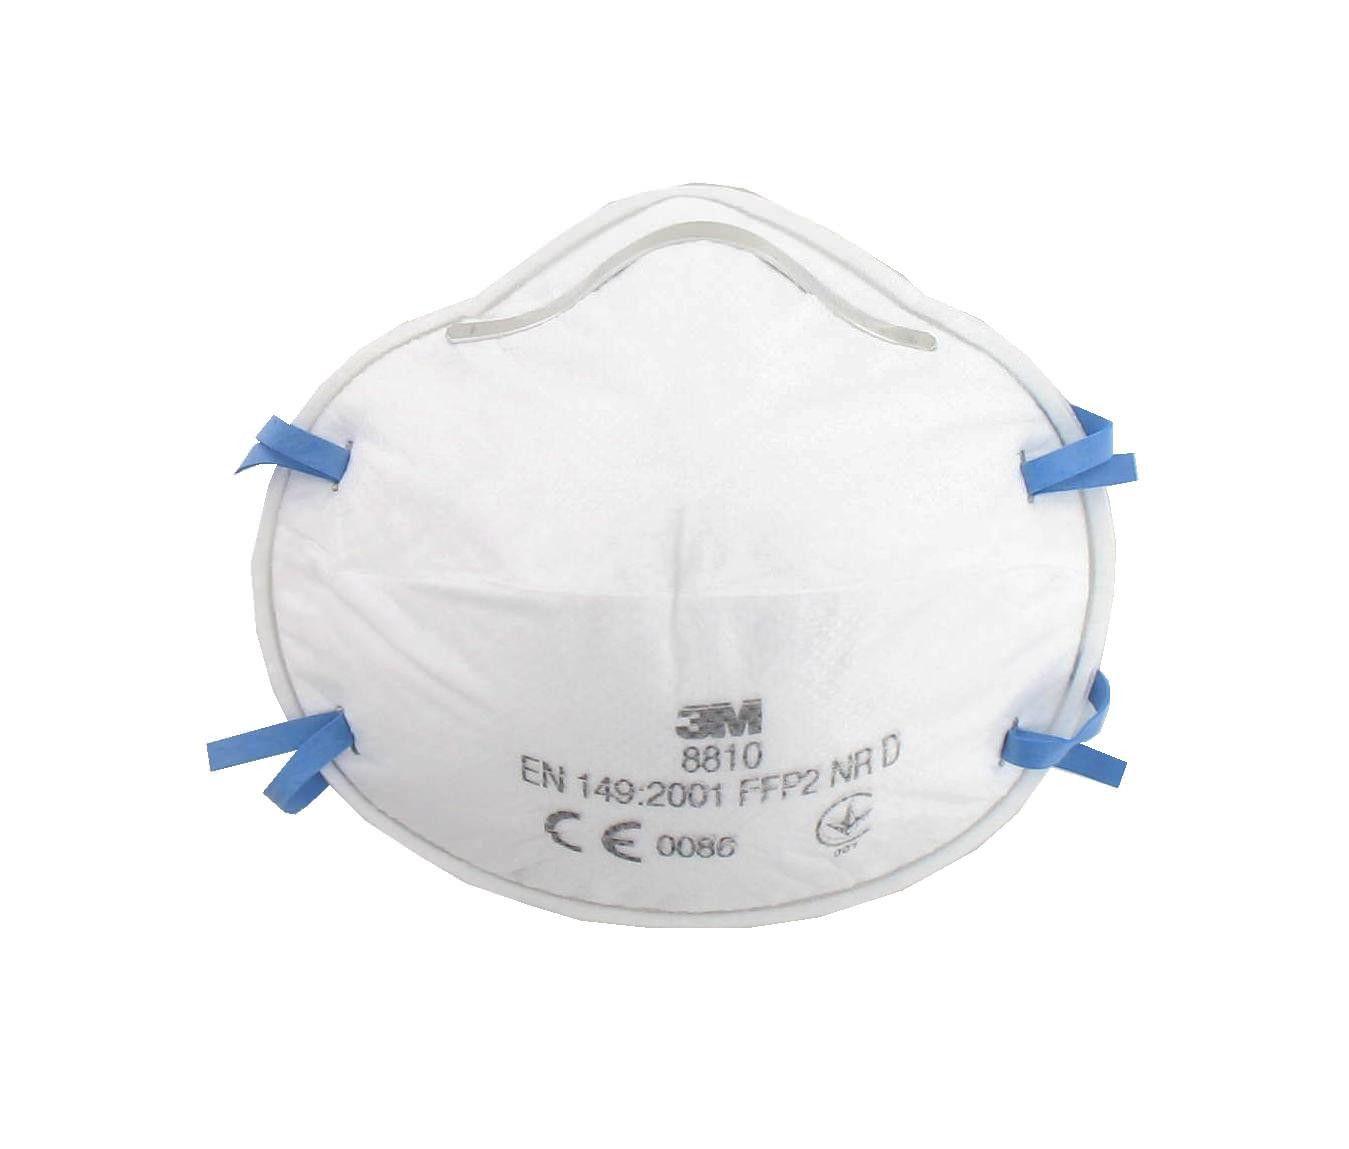 3m mundschutz maske n95